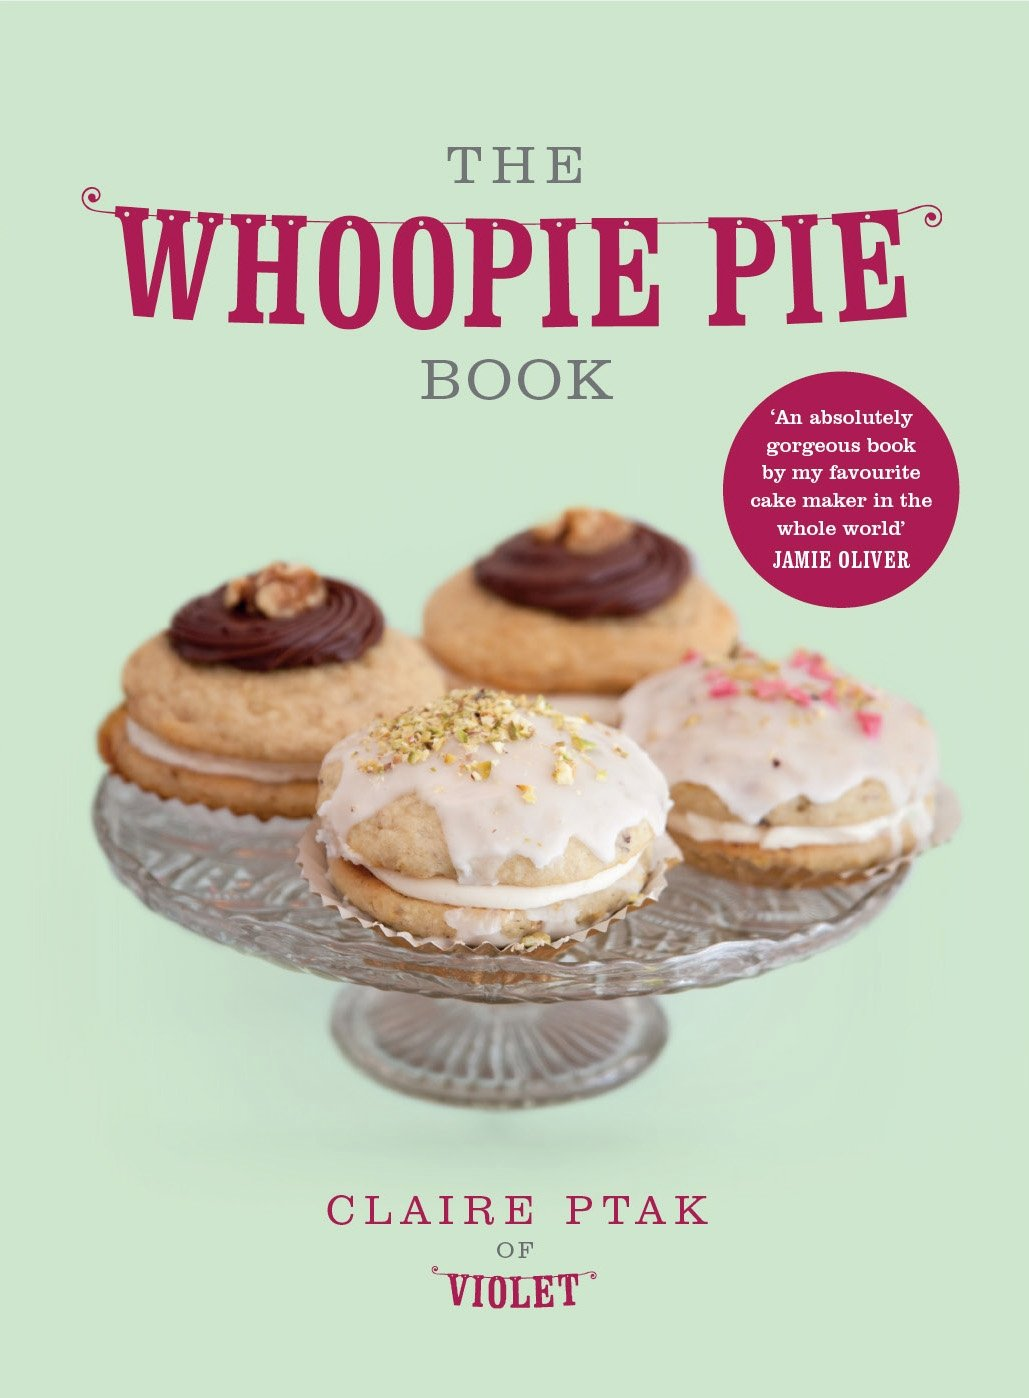 The Whoopie Pie Book: Amazon.es: Claire Ptak: Libros en idiomas extranjeros